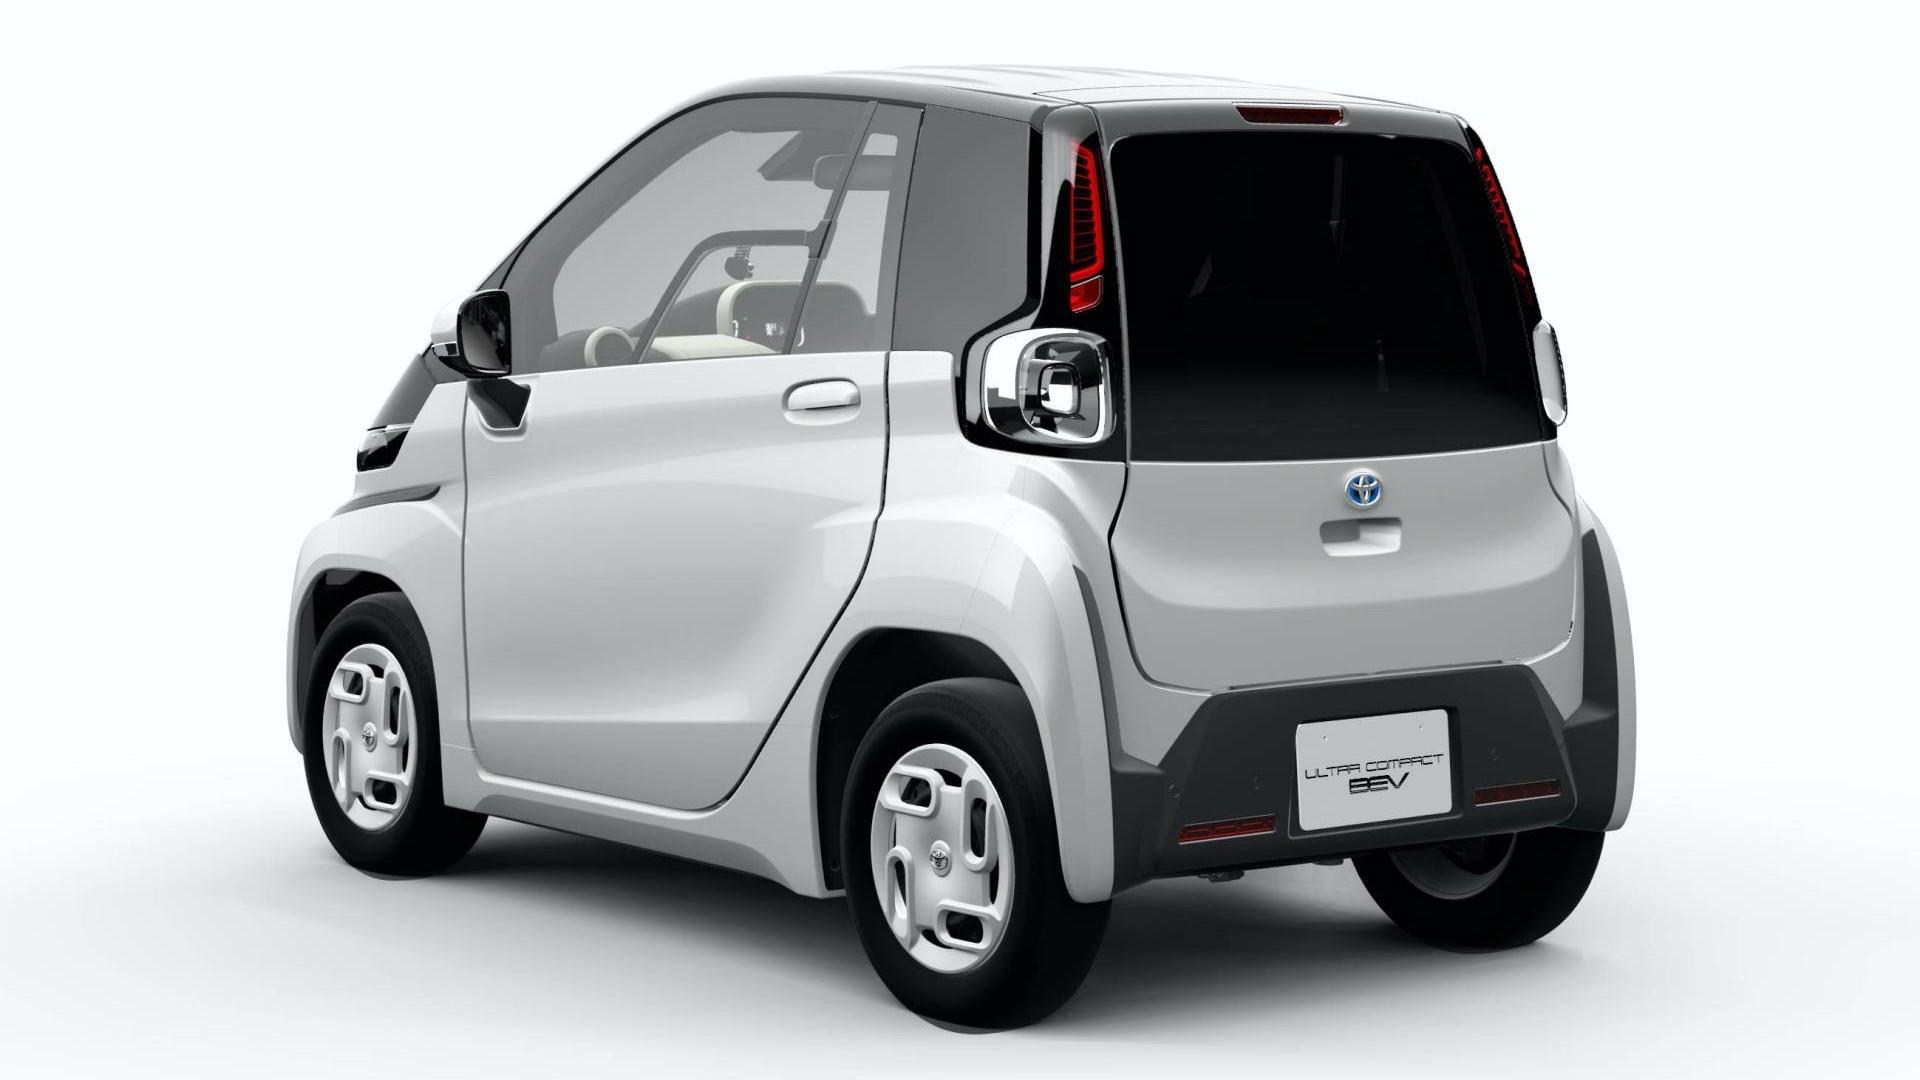 Toyota Ulta Compact BEV (3)